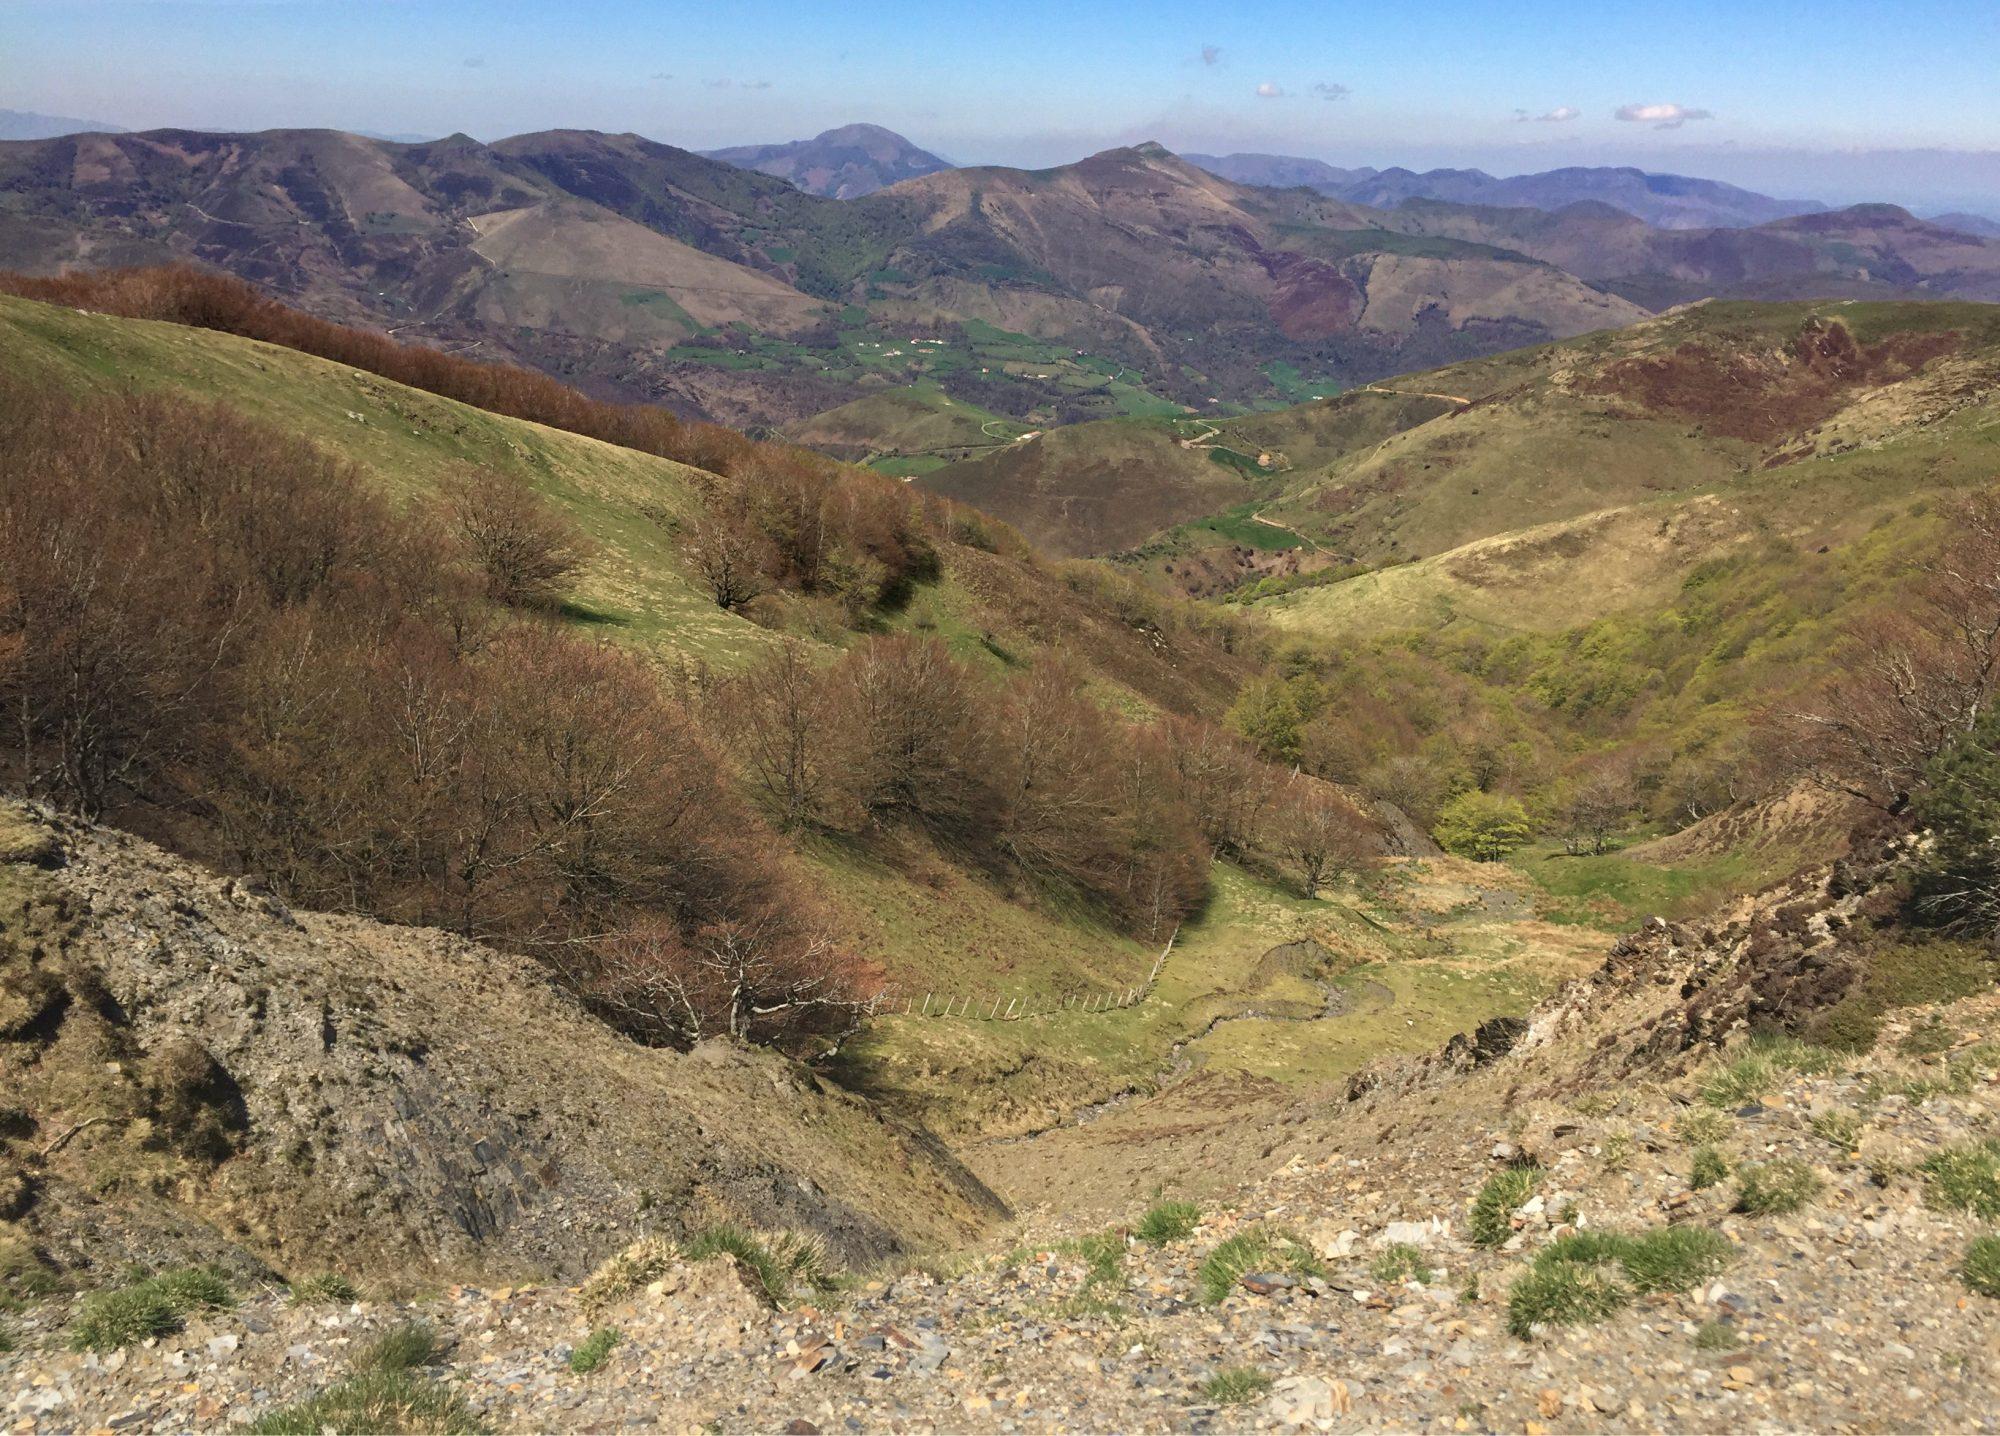 Bergblick auf dem Ibaneta Pass, Camino Francés, Wandern, Wandertour, Pilgern, Jakobsweg, Pyrenäeen, Frankreich, Spanien